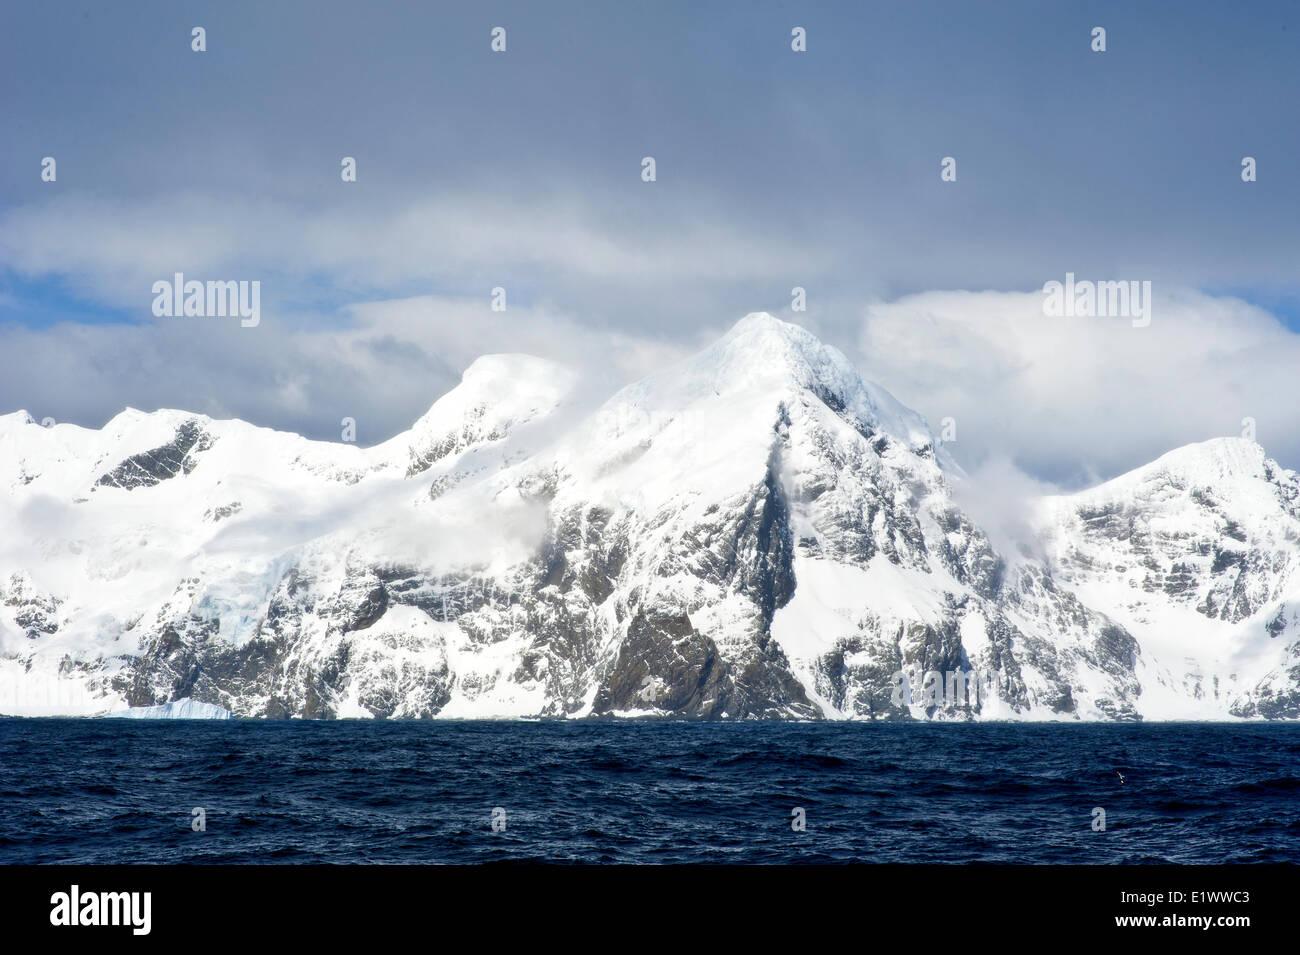 Elephant Island, South Shetland Islands, Antarctic Peninsula. Location of Shackelton expedition overwintering site. - Stock Image